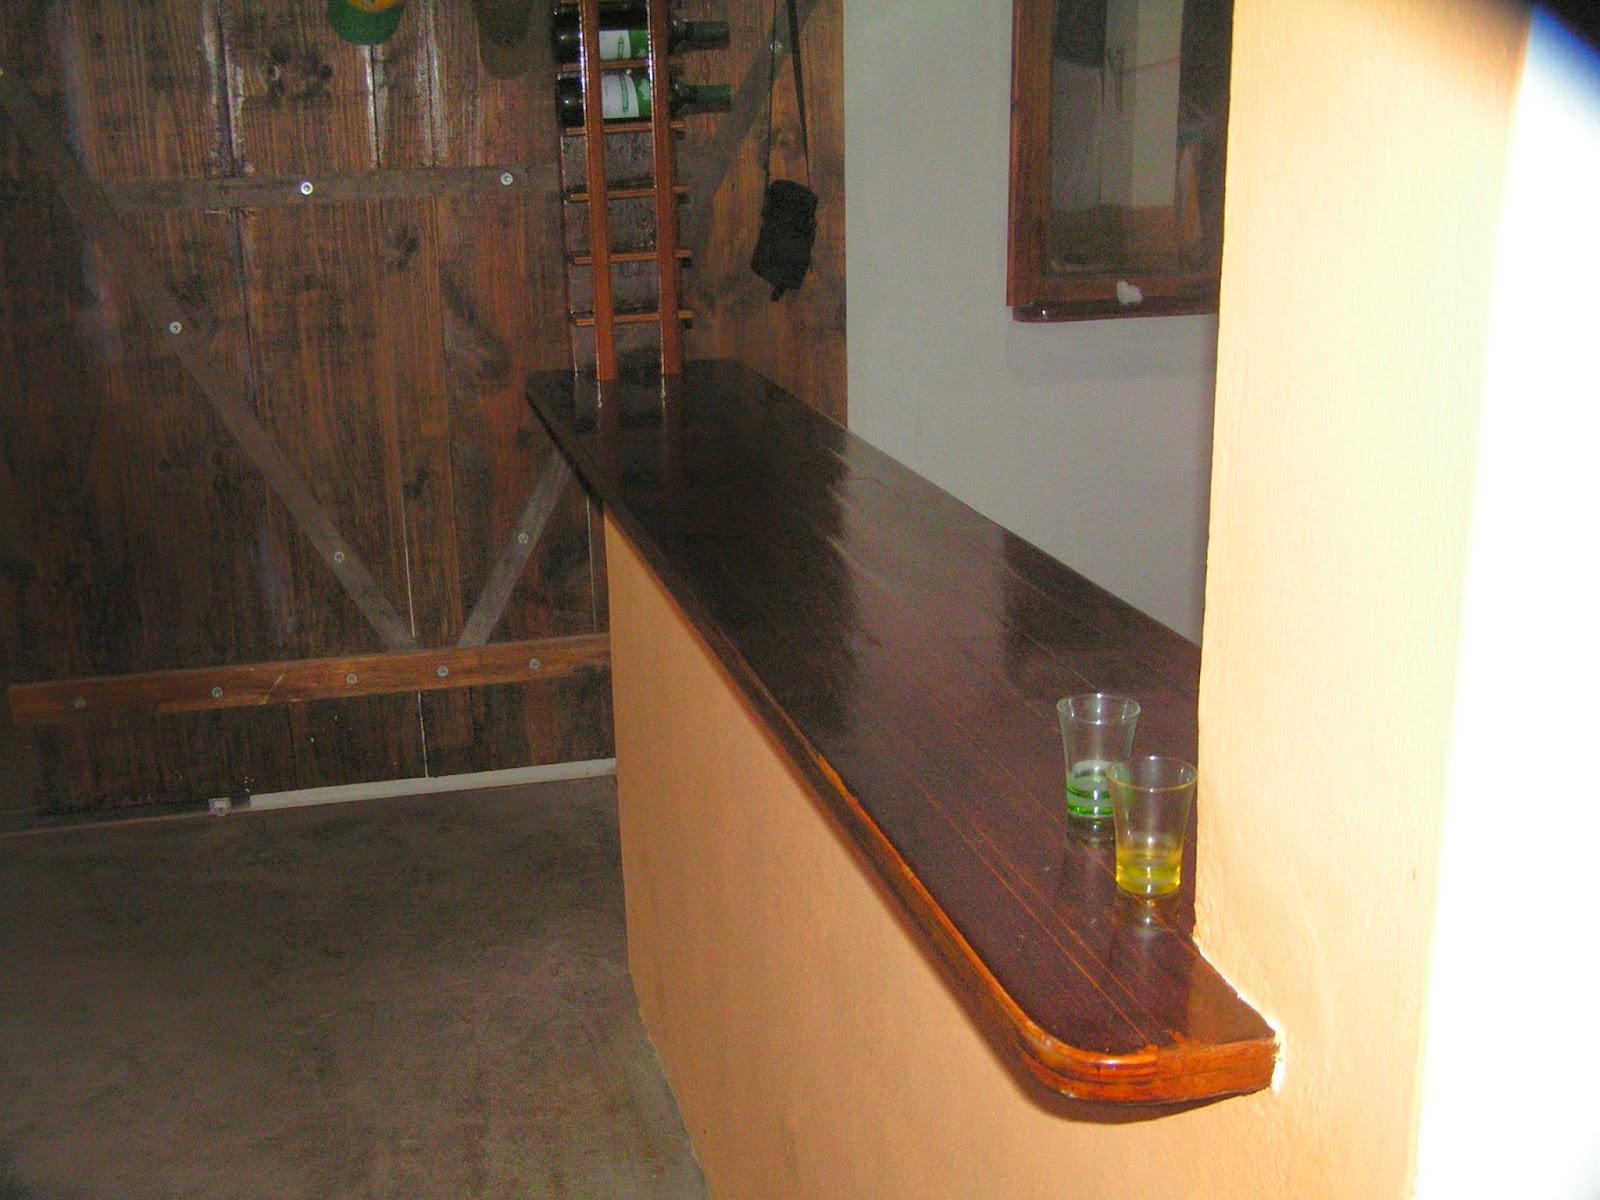 TENNER: Projeto Bancada Cozinha Americana Rustica #C1760A 1600 1200